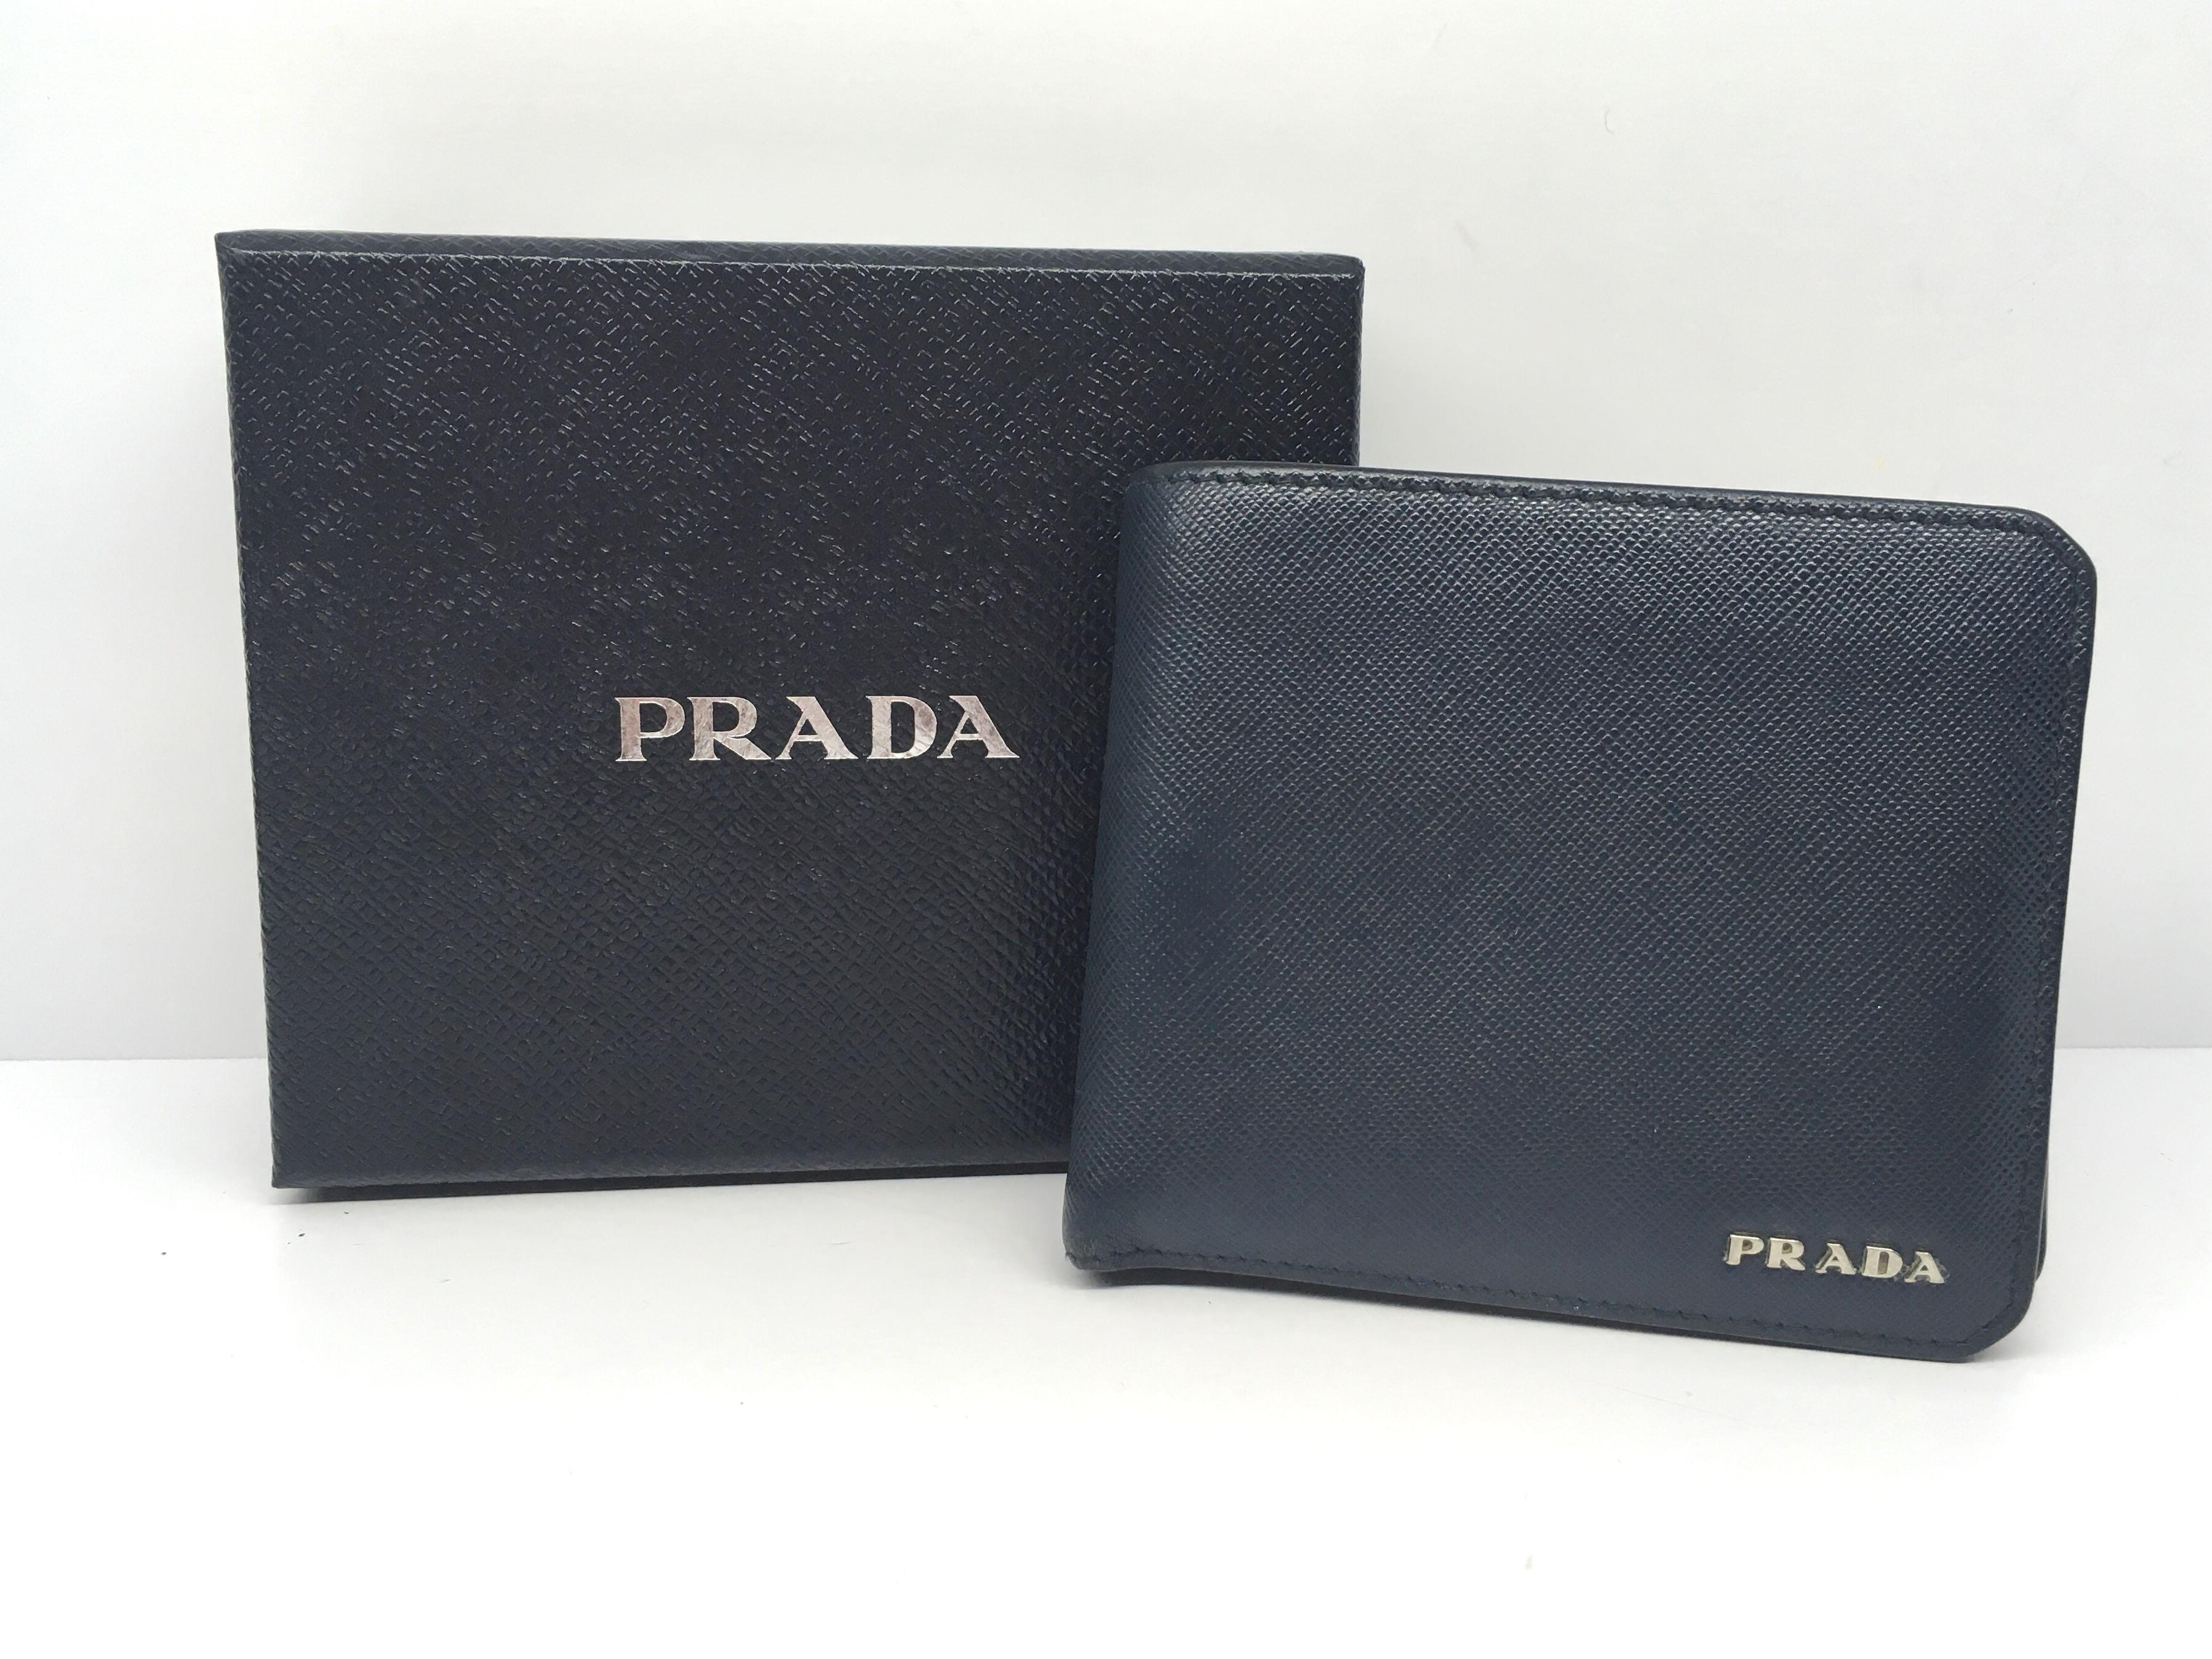 8d8377ef4aff15 Prada Navy Blue Wallet, Luxury, Bags & Wallets, Wallets on Carousell